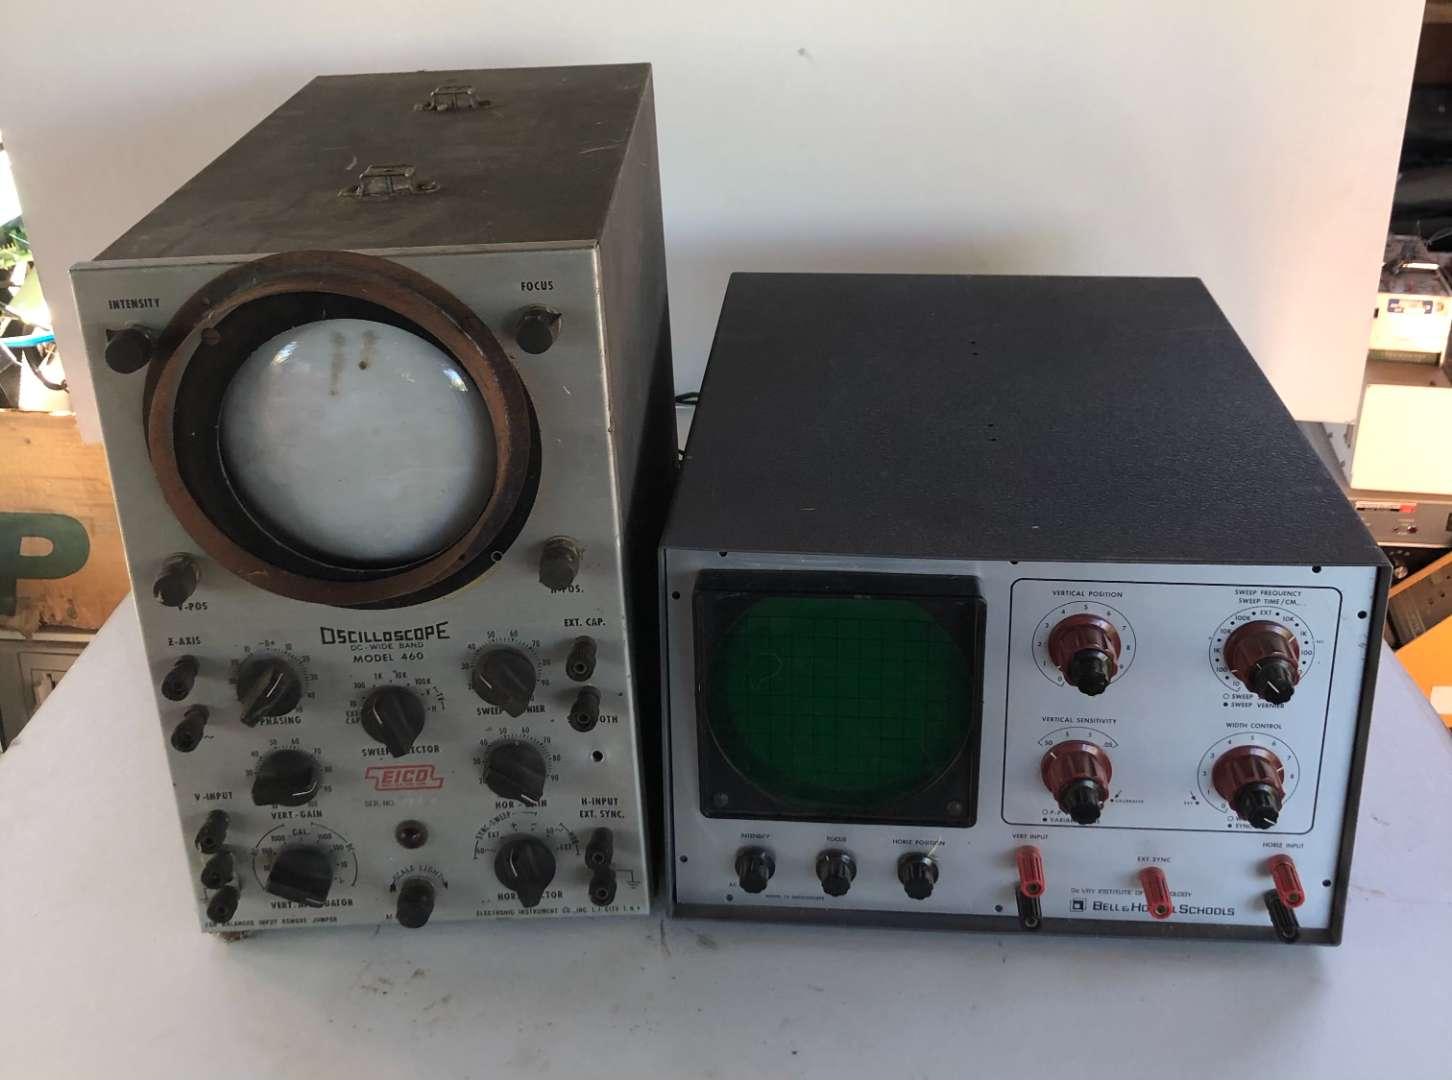 Lot # 162 - Lot of 2 Oscilloscopes EICO, Bell & Howell Schools (main image)